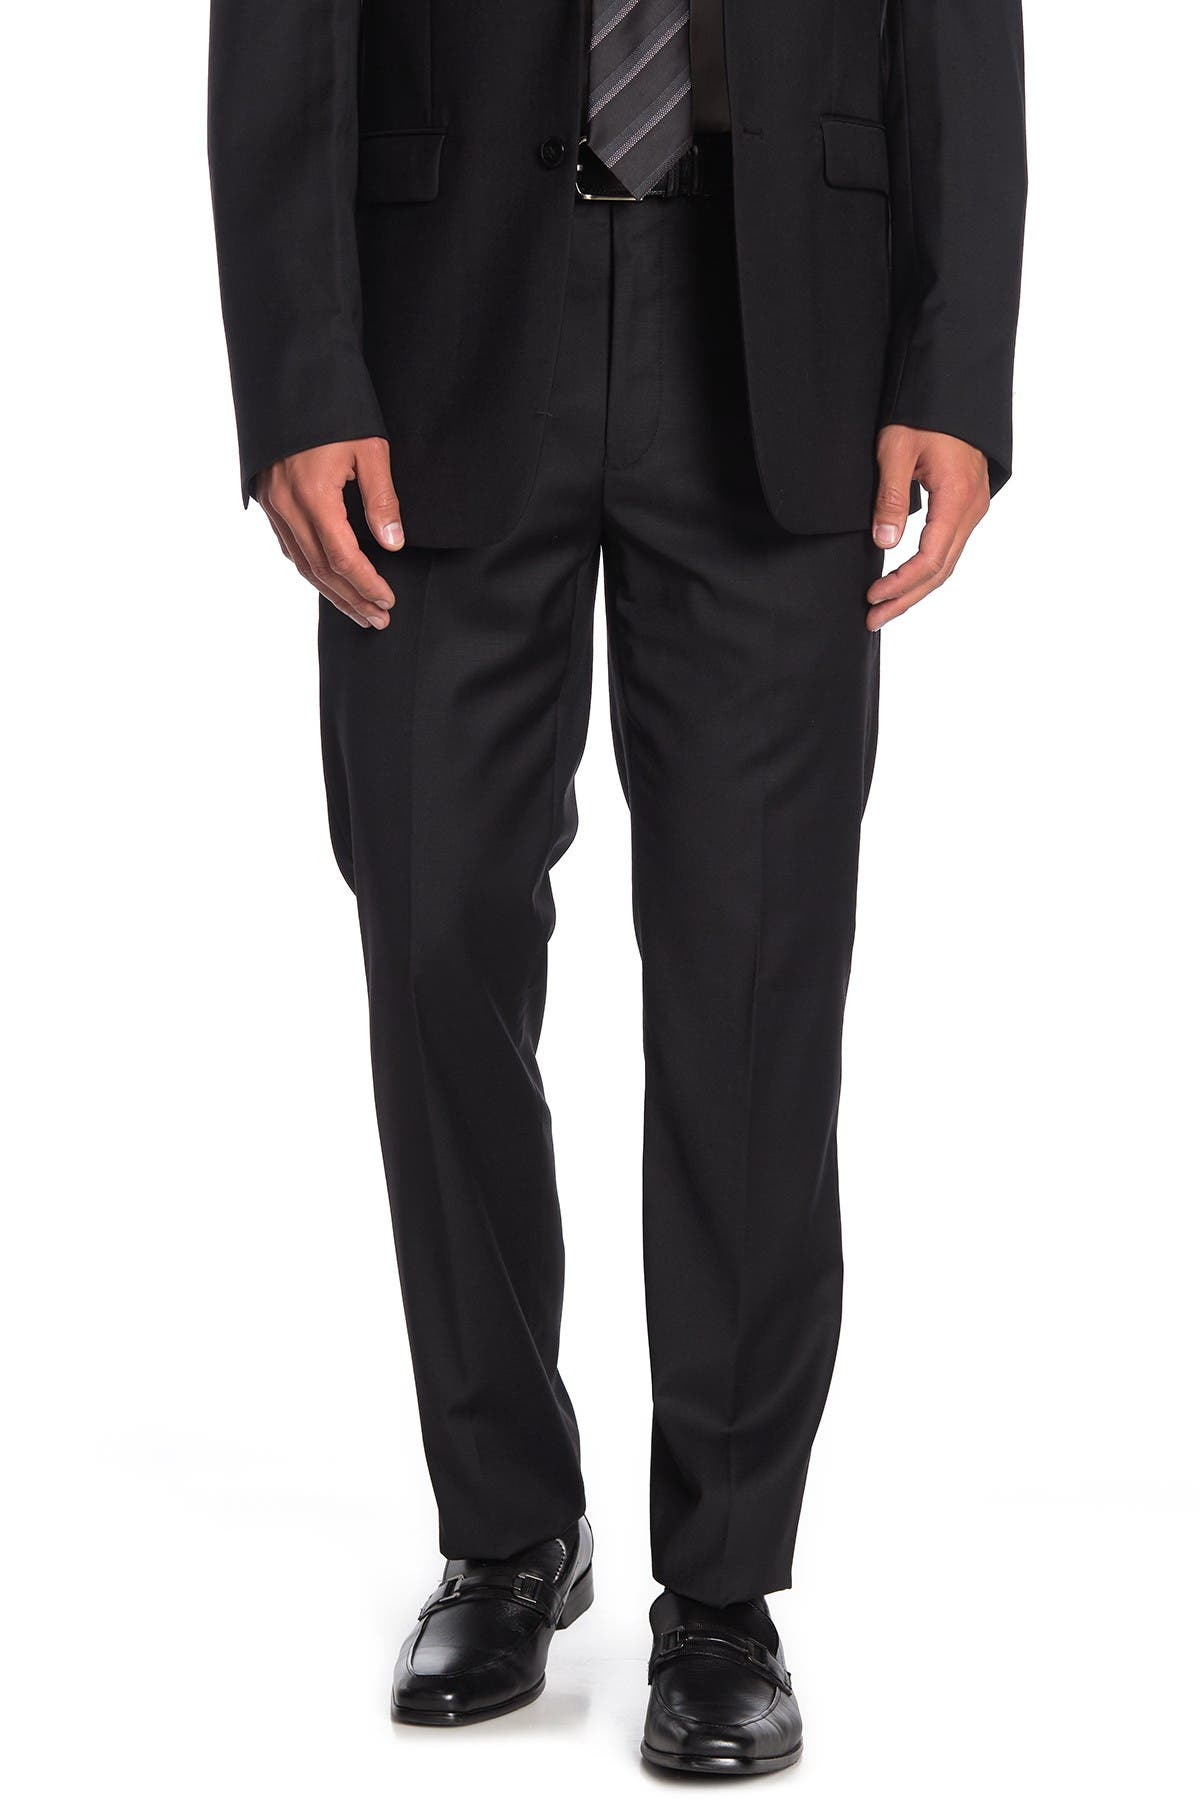 "Image of Calvin Klein Solid Black Suit Separates Pants - 30-34"" Inseam"